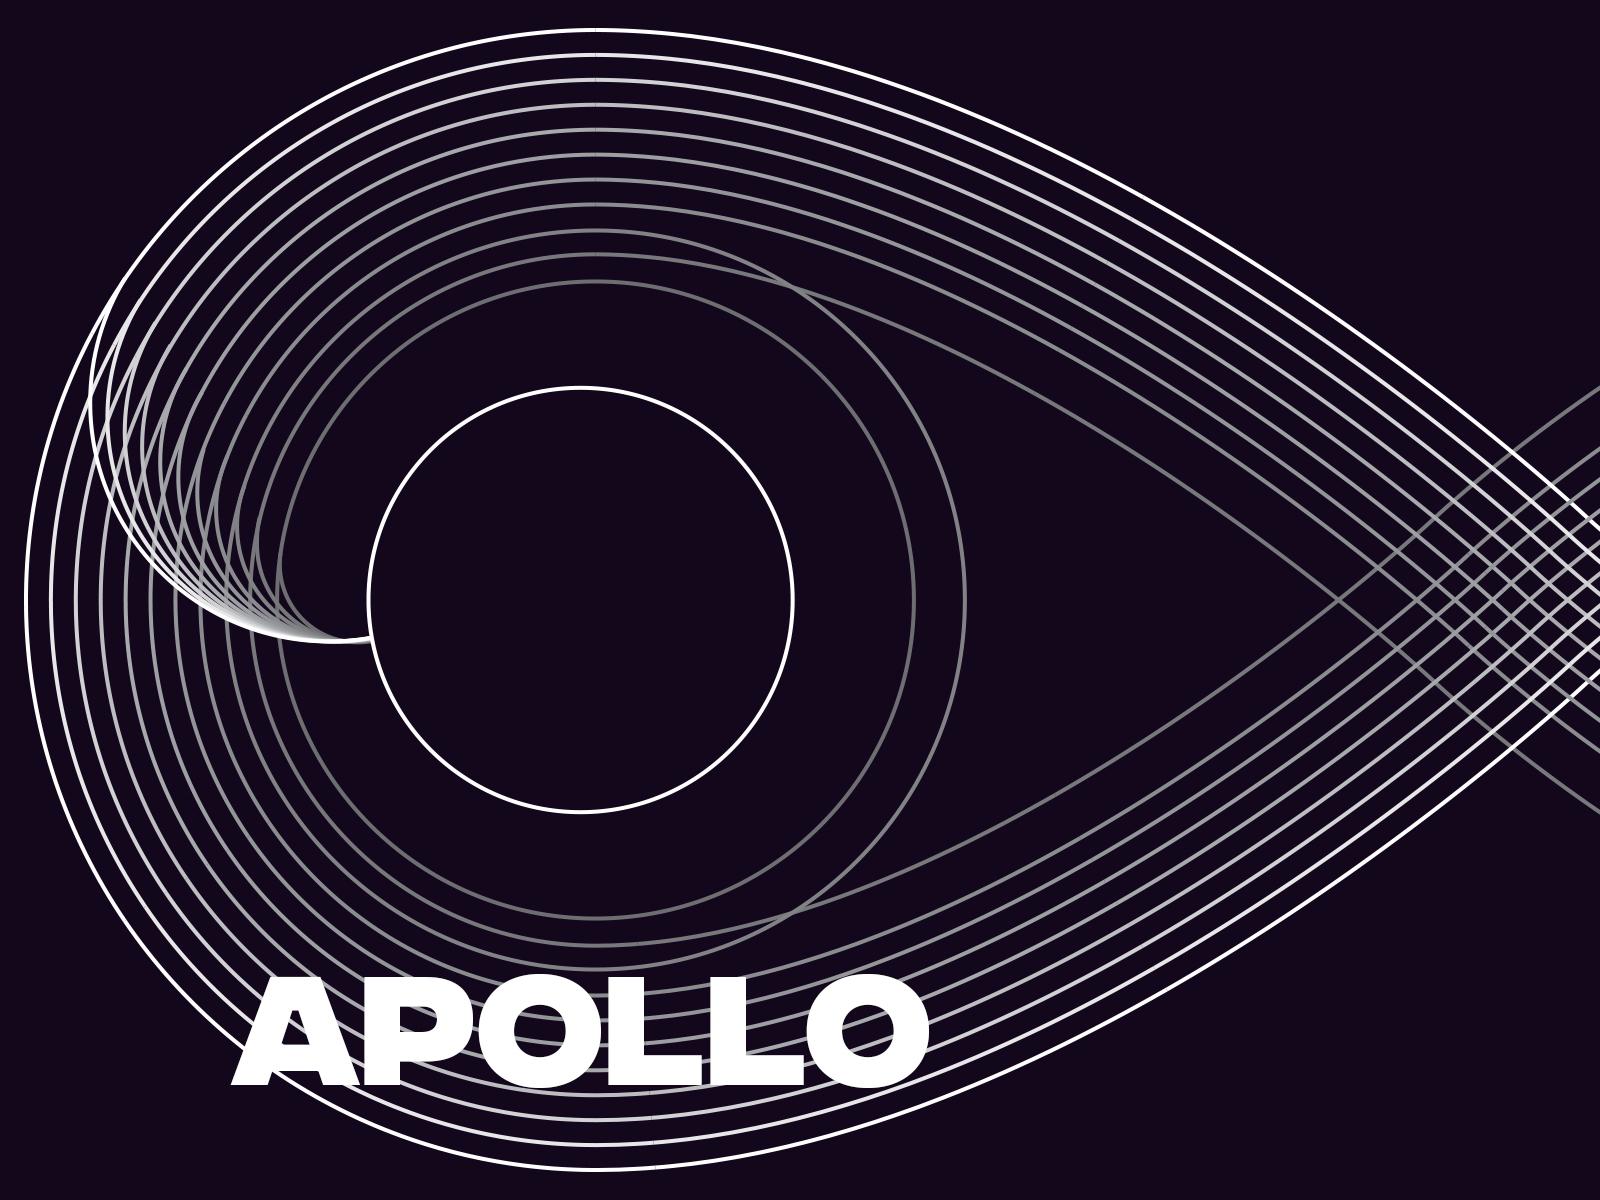 Apollo trajectory 01